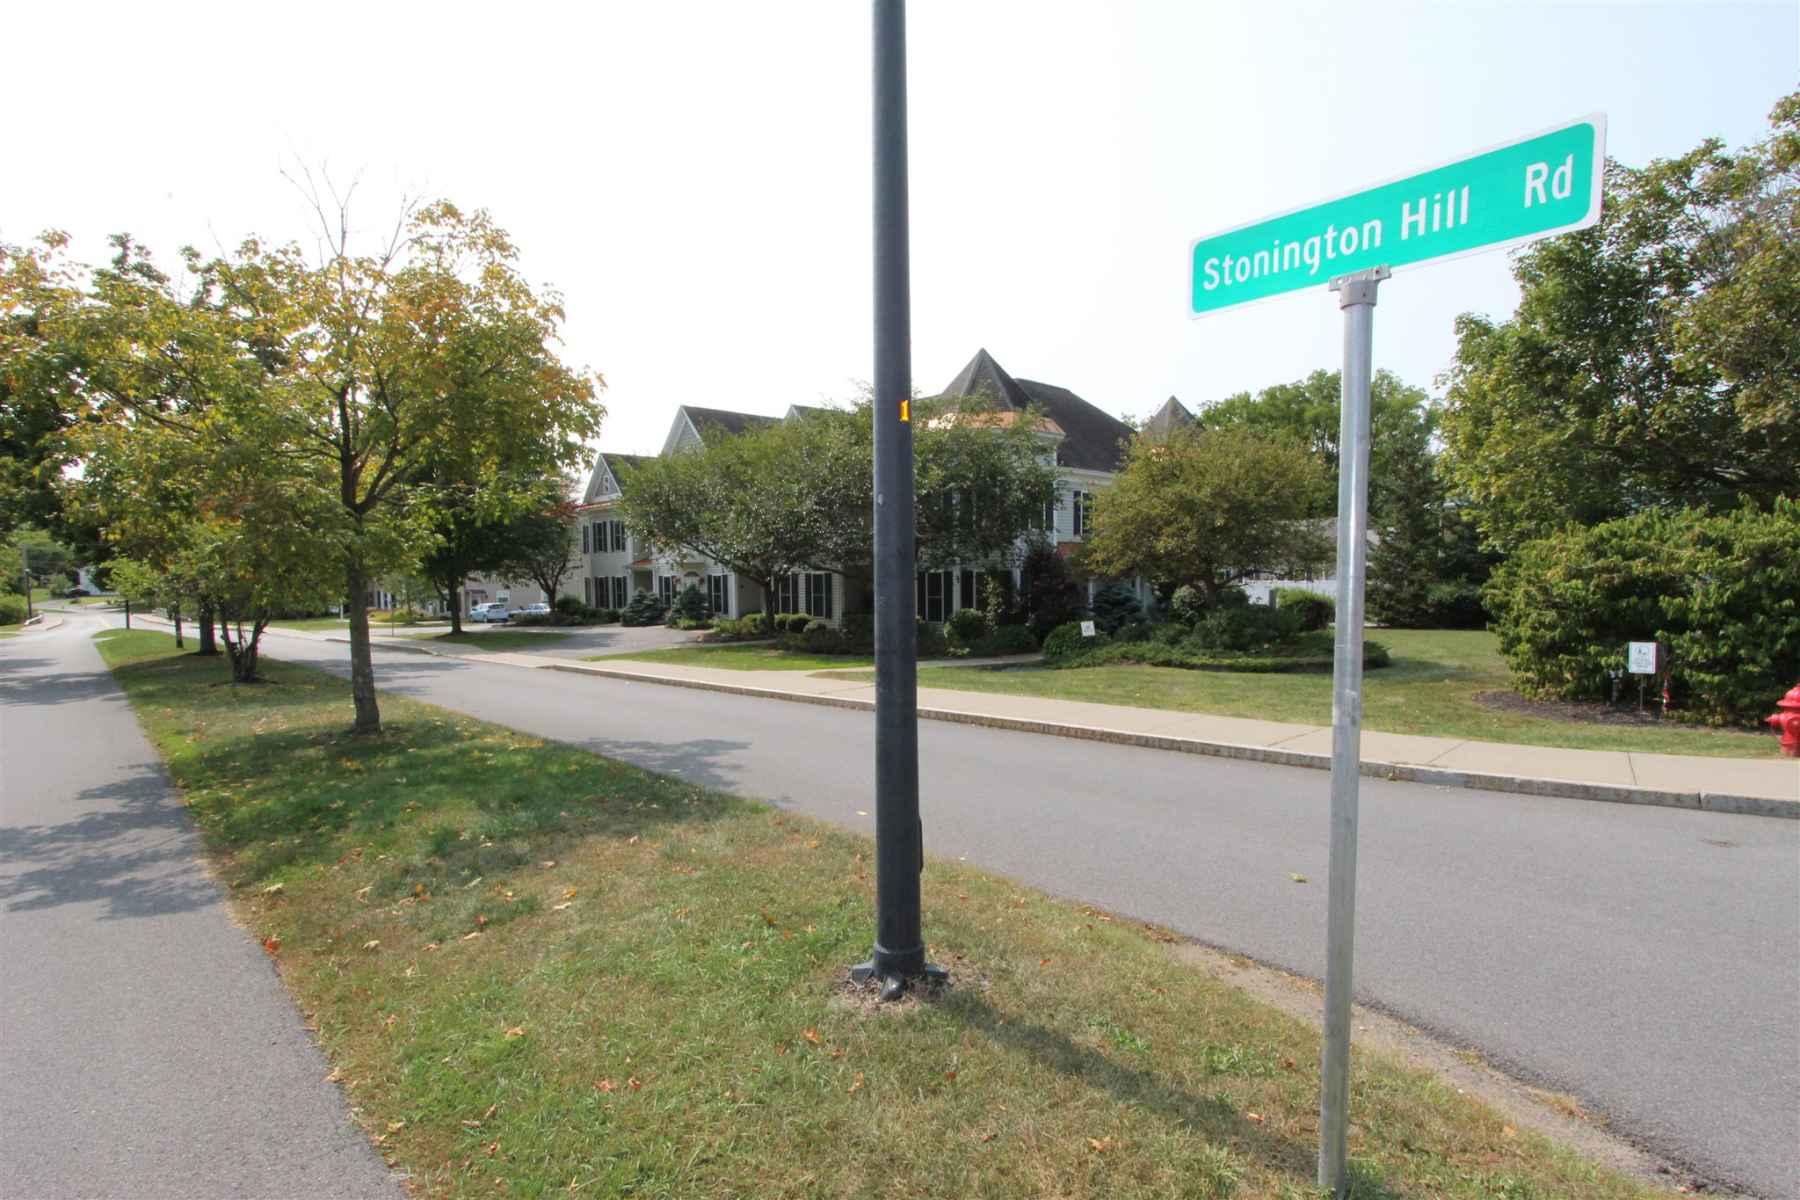 Photo for2 STONINGTON HILL RD